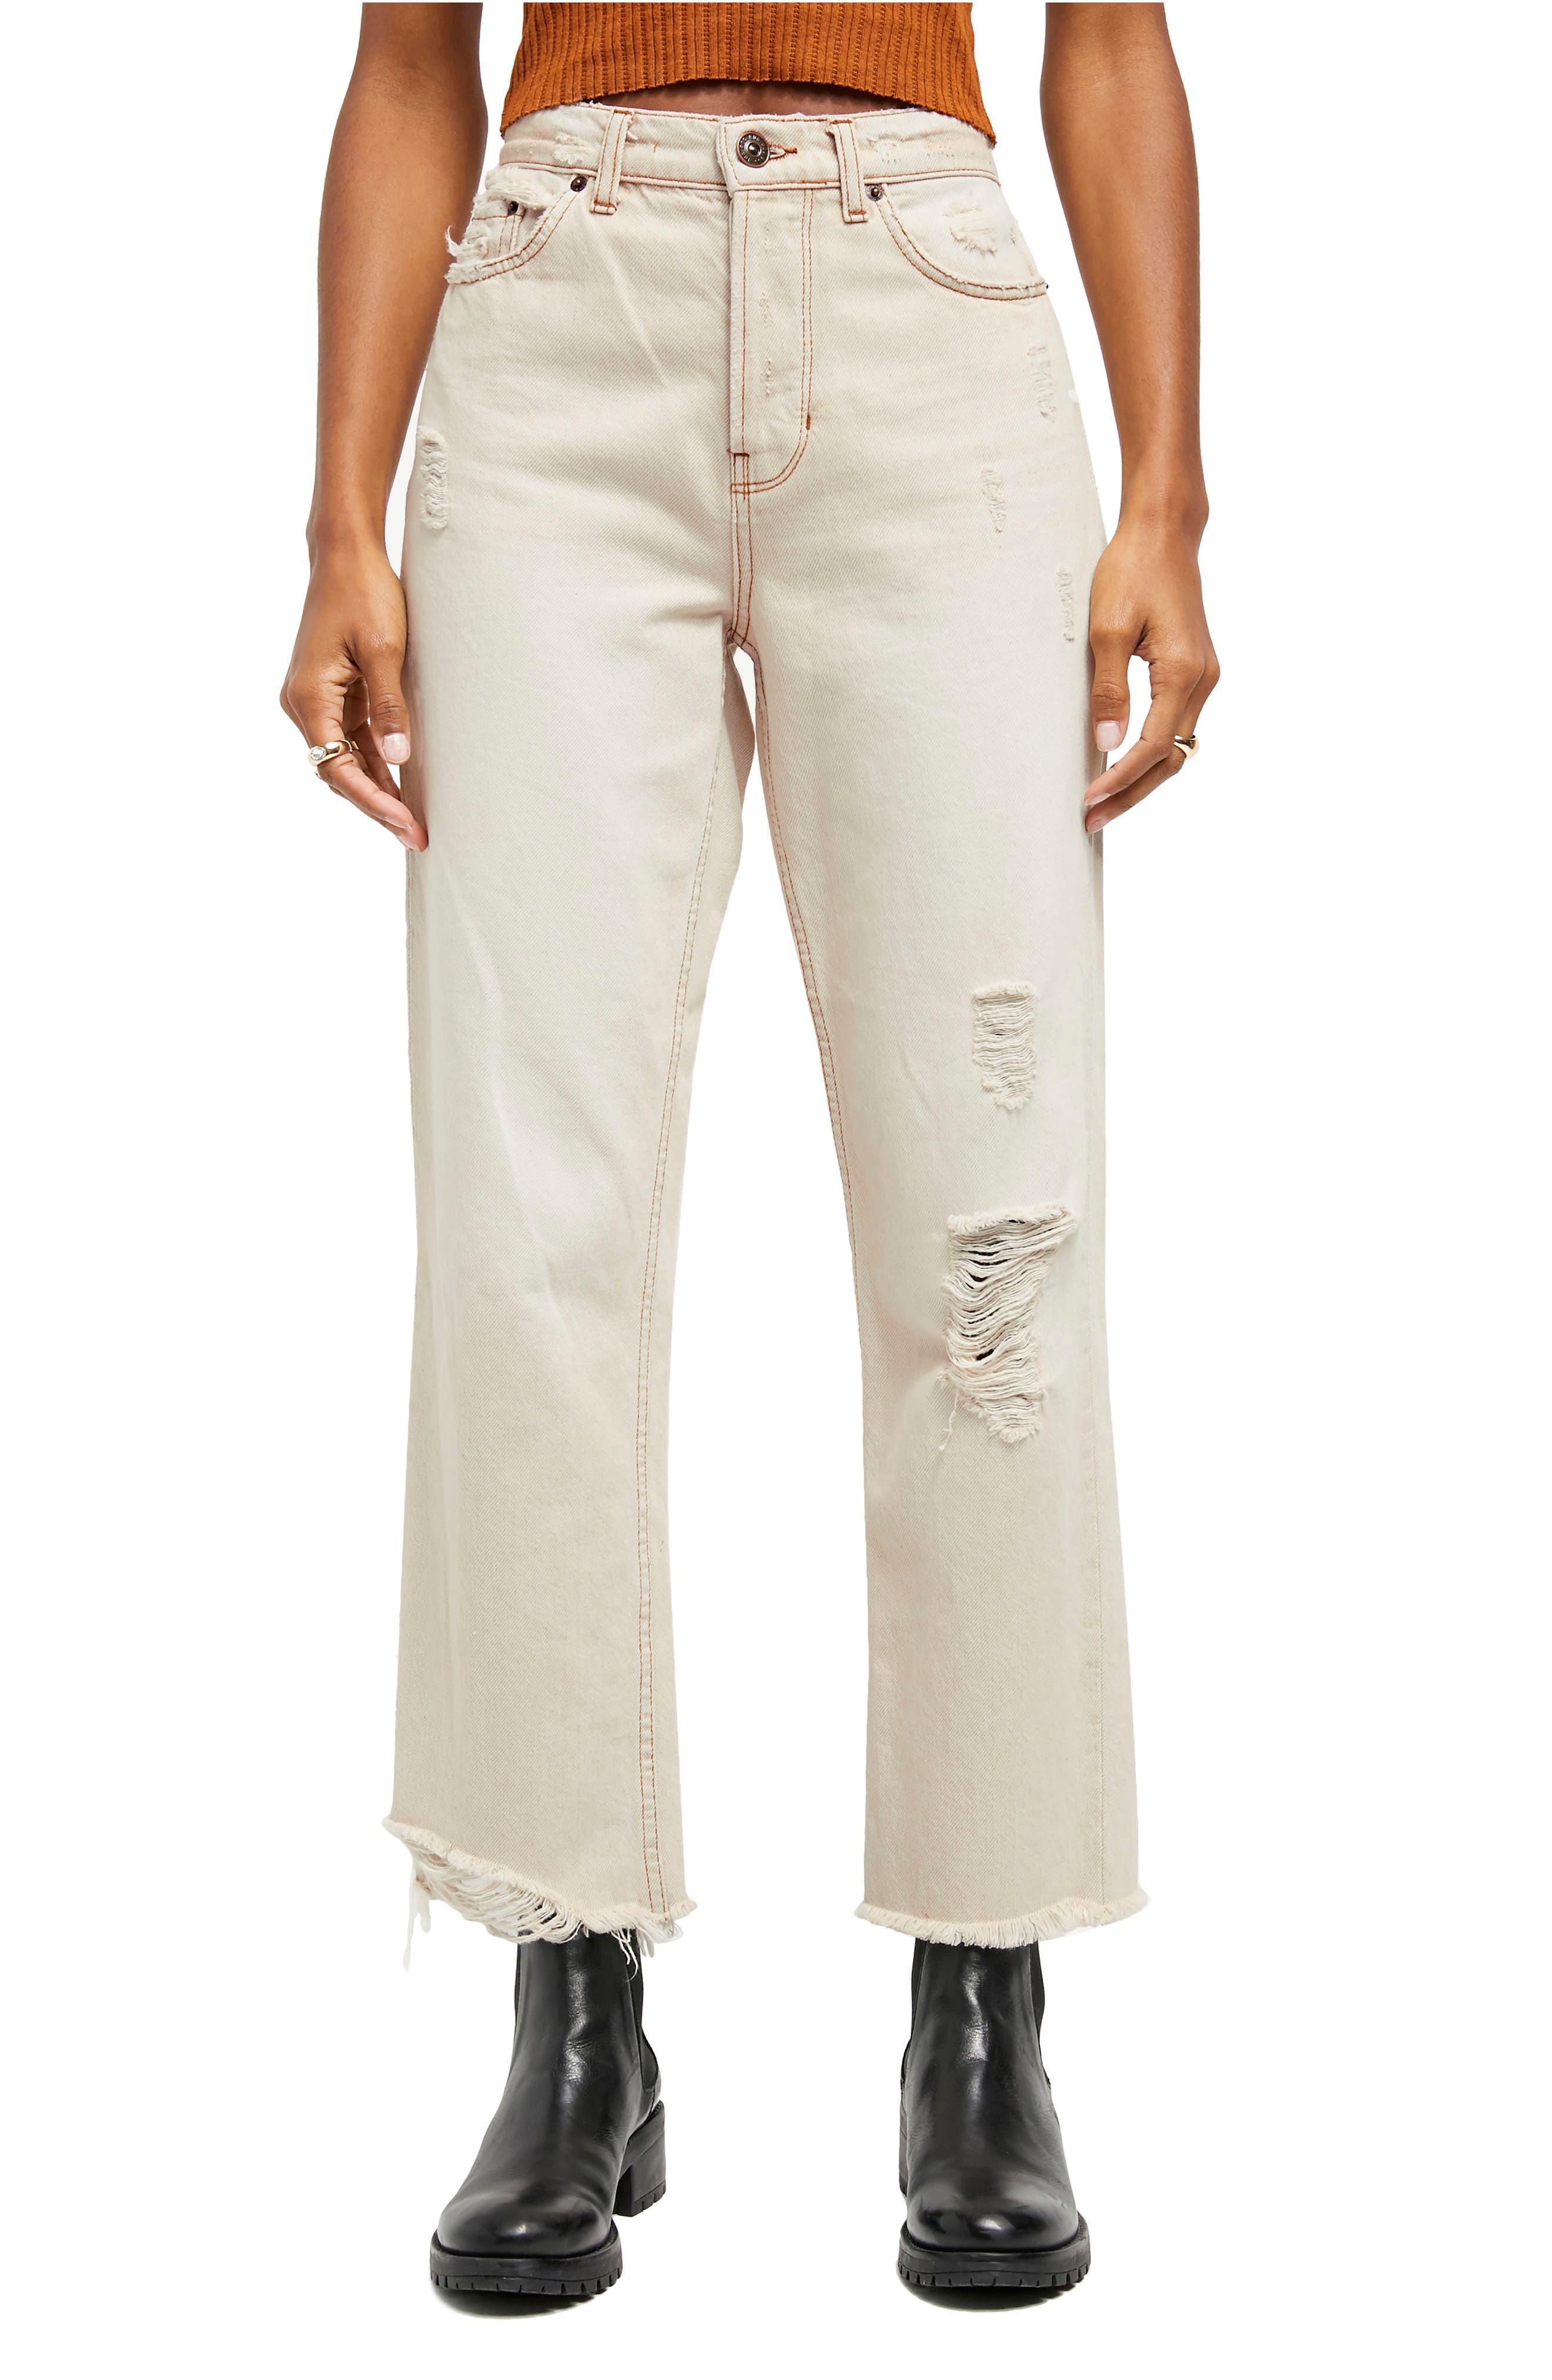 Pax Raw Hem Ripped High Waist Jeans